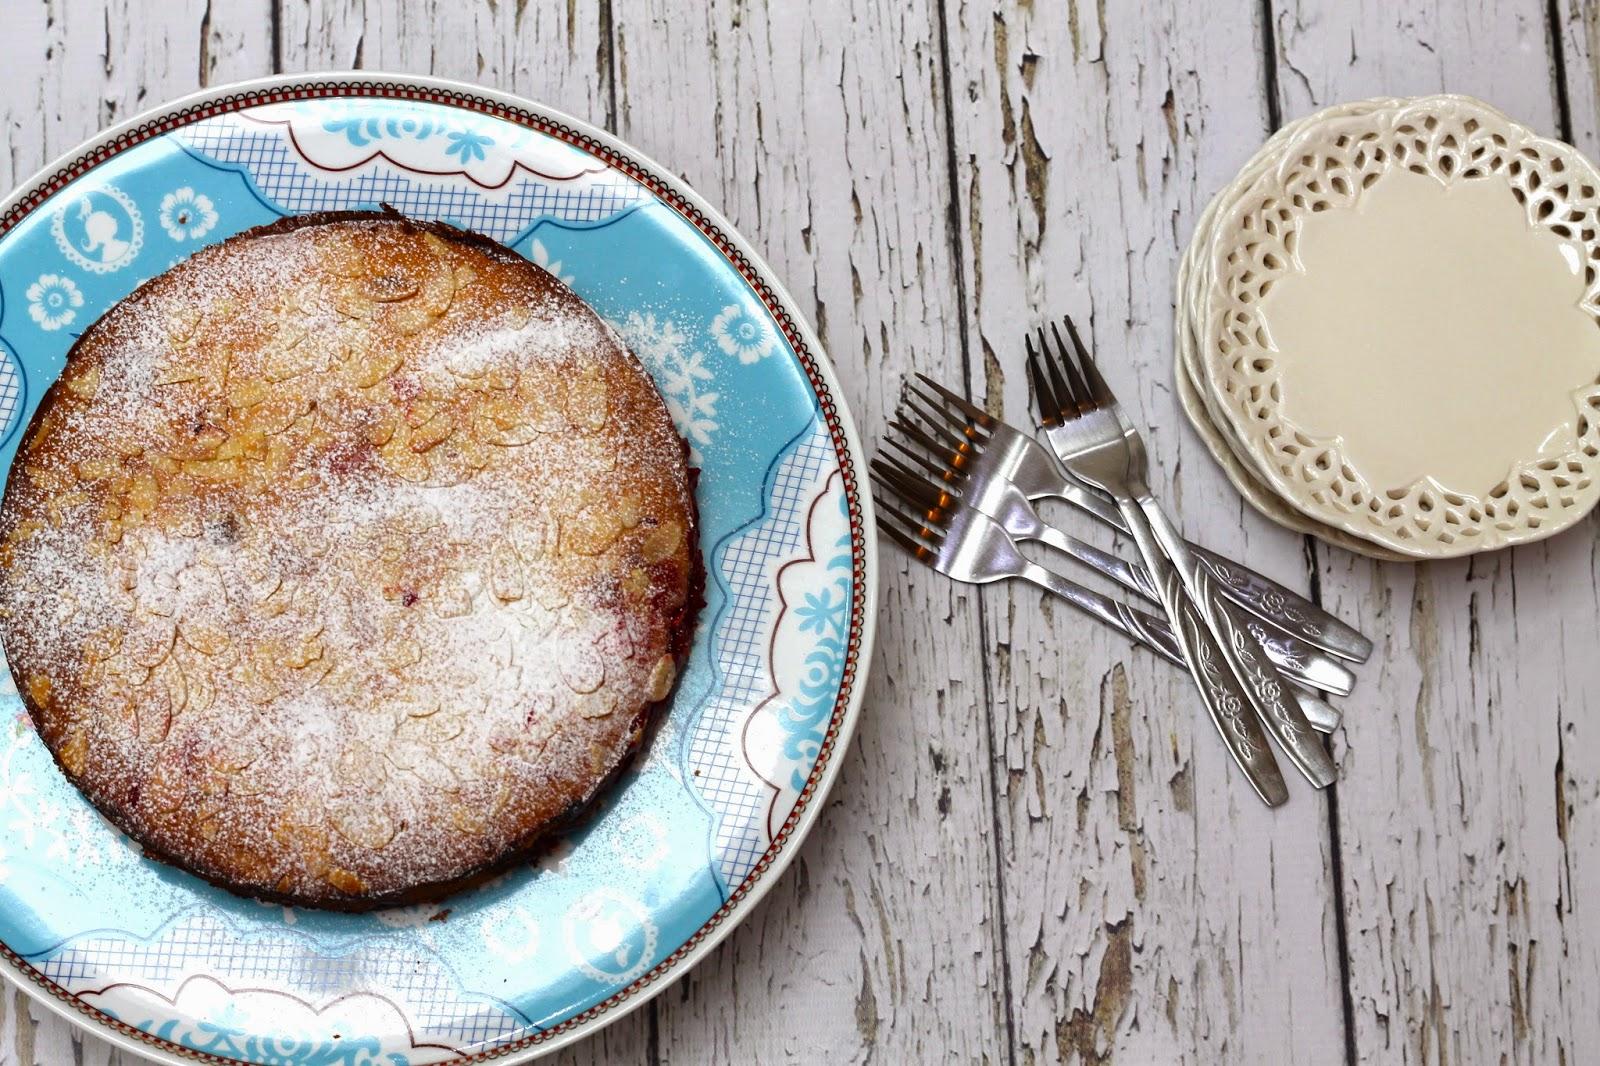 Raspberry and Lemon Bakewell cake